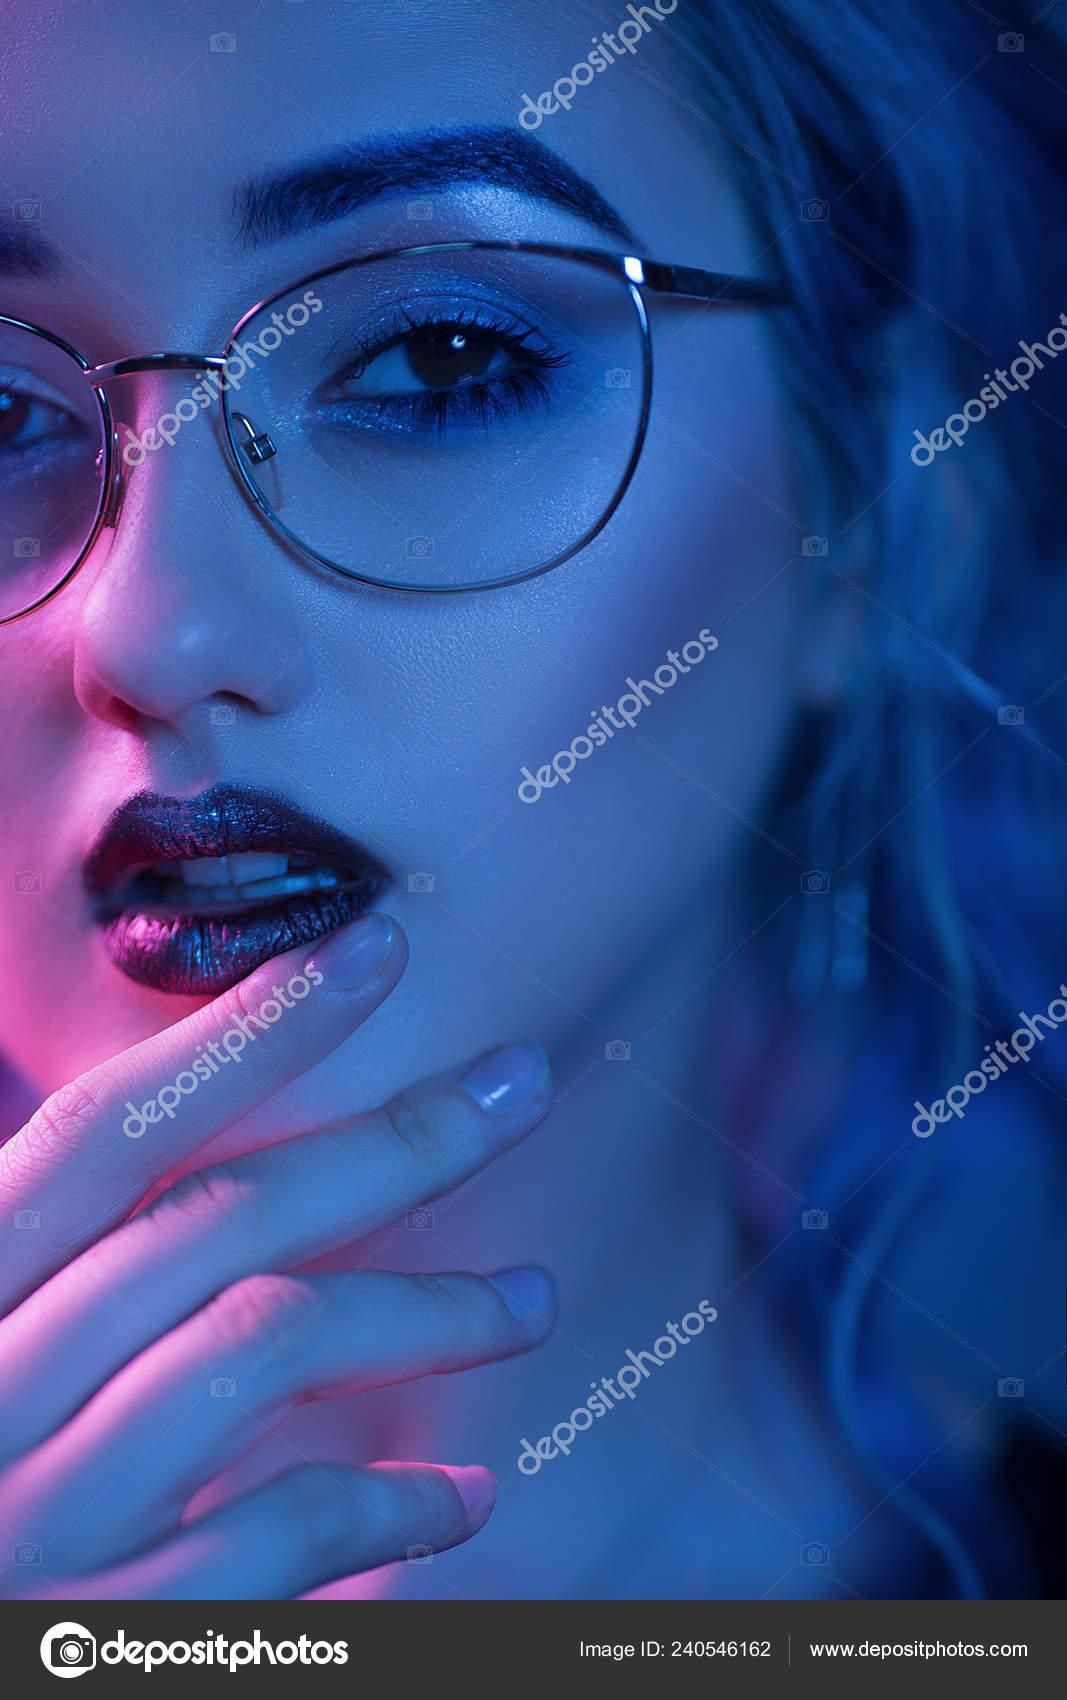 d12ac3e98341 Σέξι γυναίκα σε ποτήρια με Βραδινό μακιγιάζ — Φωτογραφία Αρχείου ...